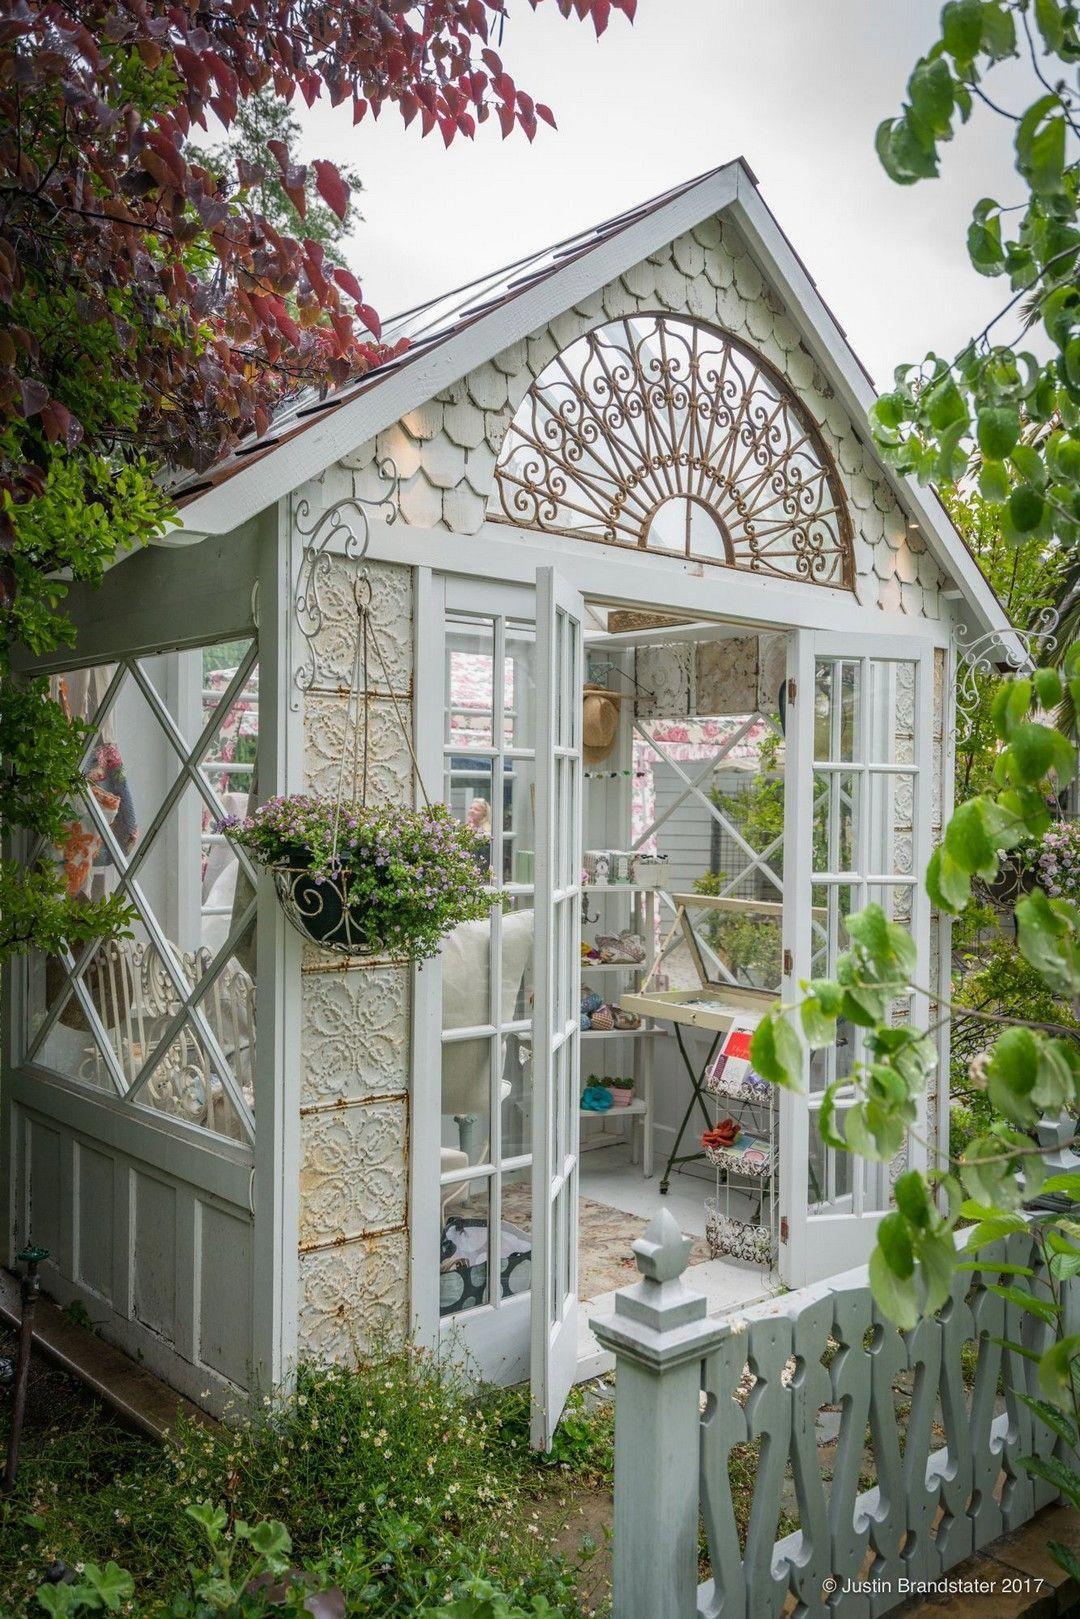 Gardendecorideas Shed Decor Cottage Garden Backyard Sheds Backyard greenhouse garden shed